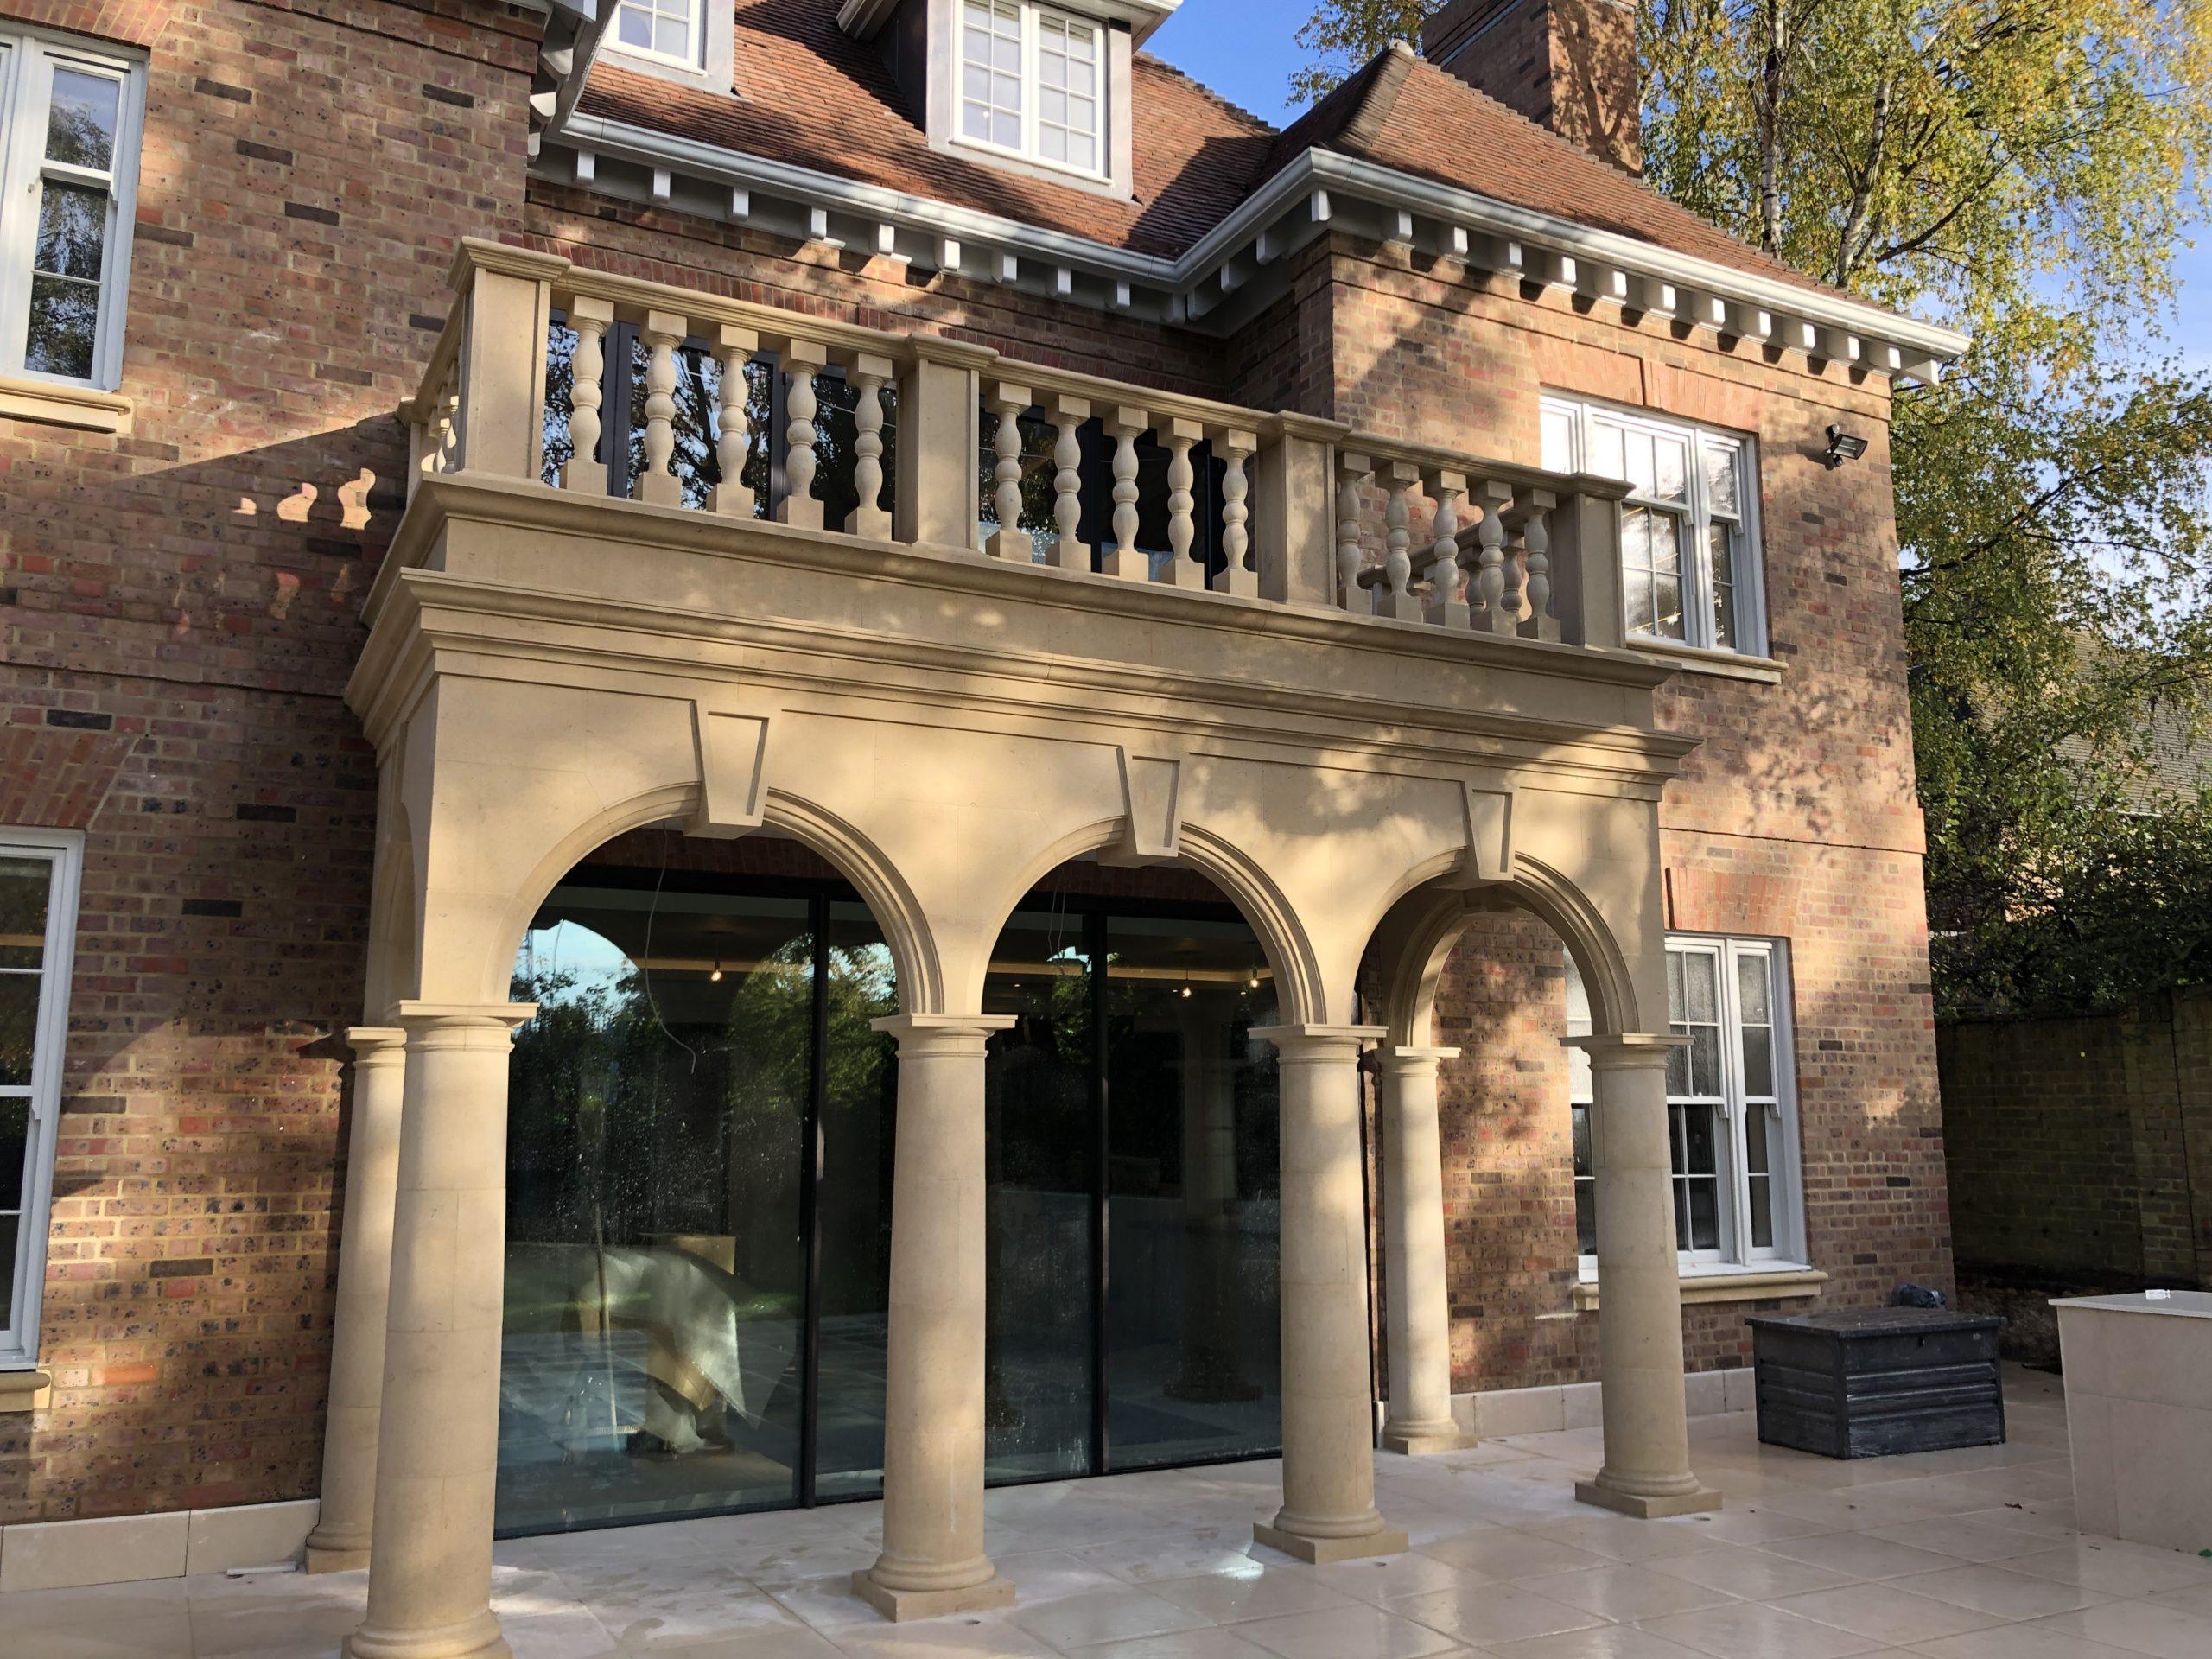 Natural stone portico, stone balustrades, stone columns